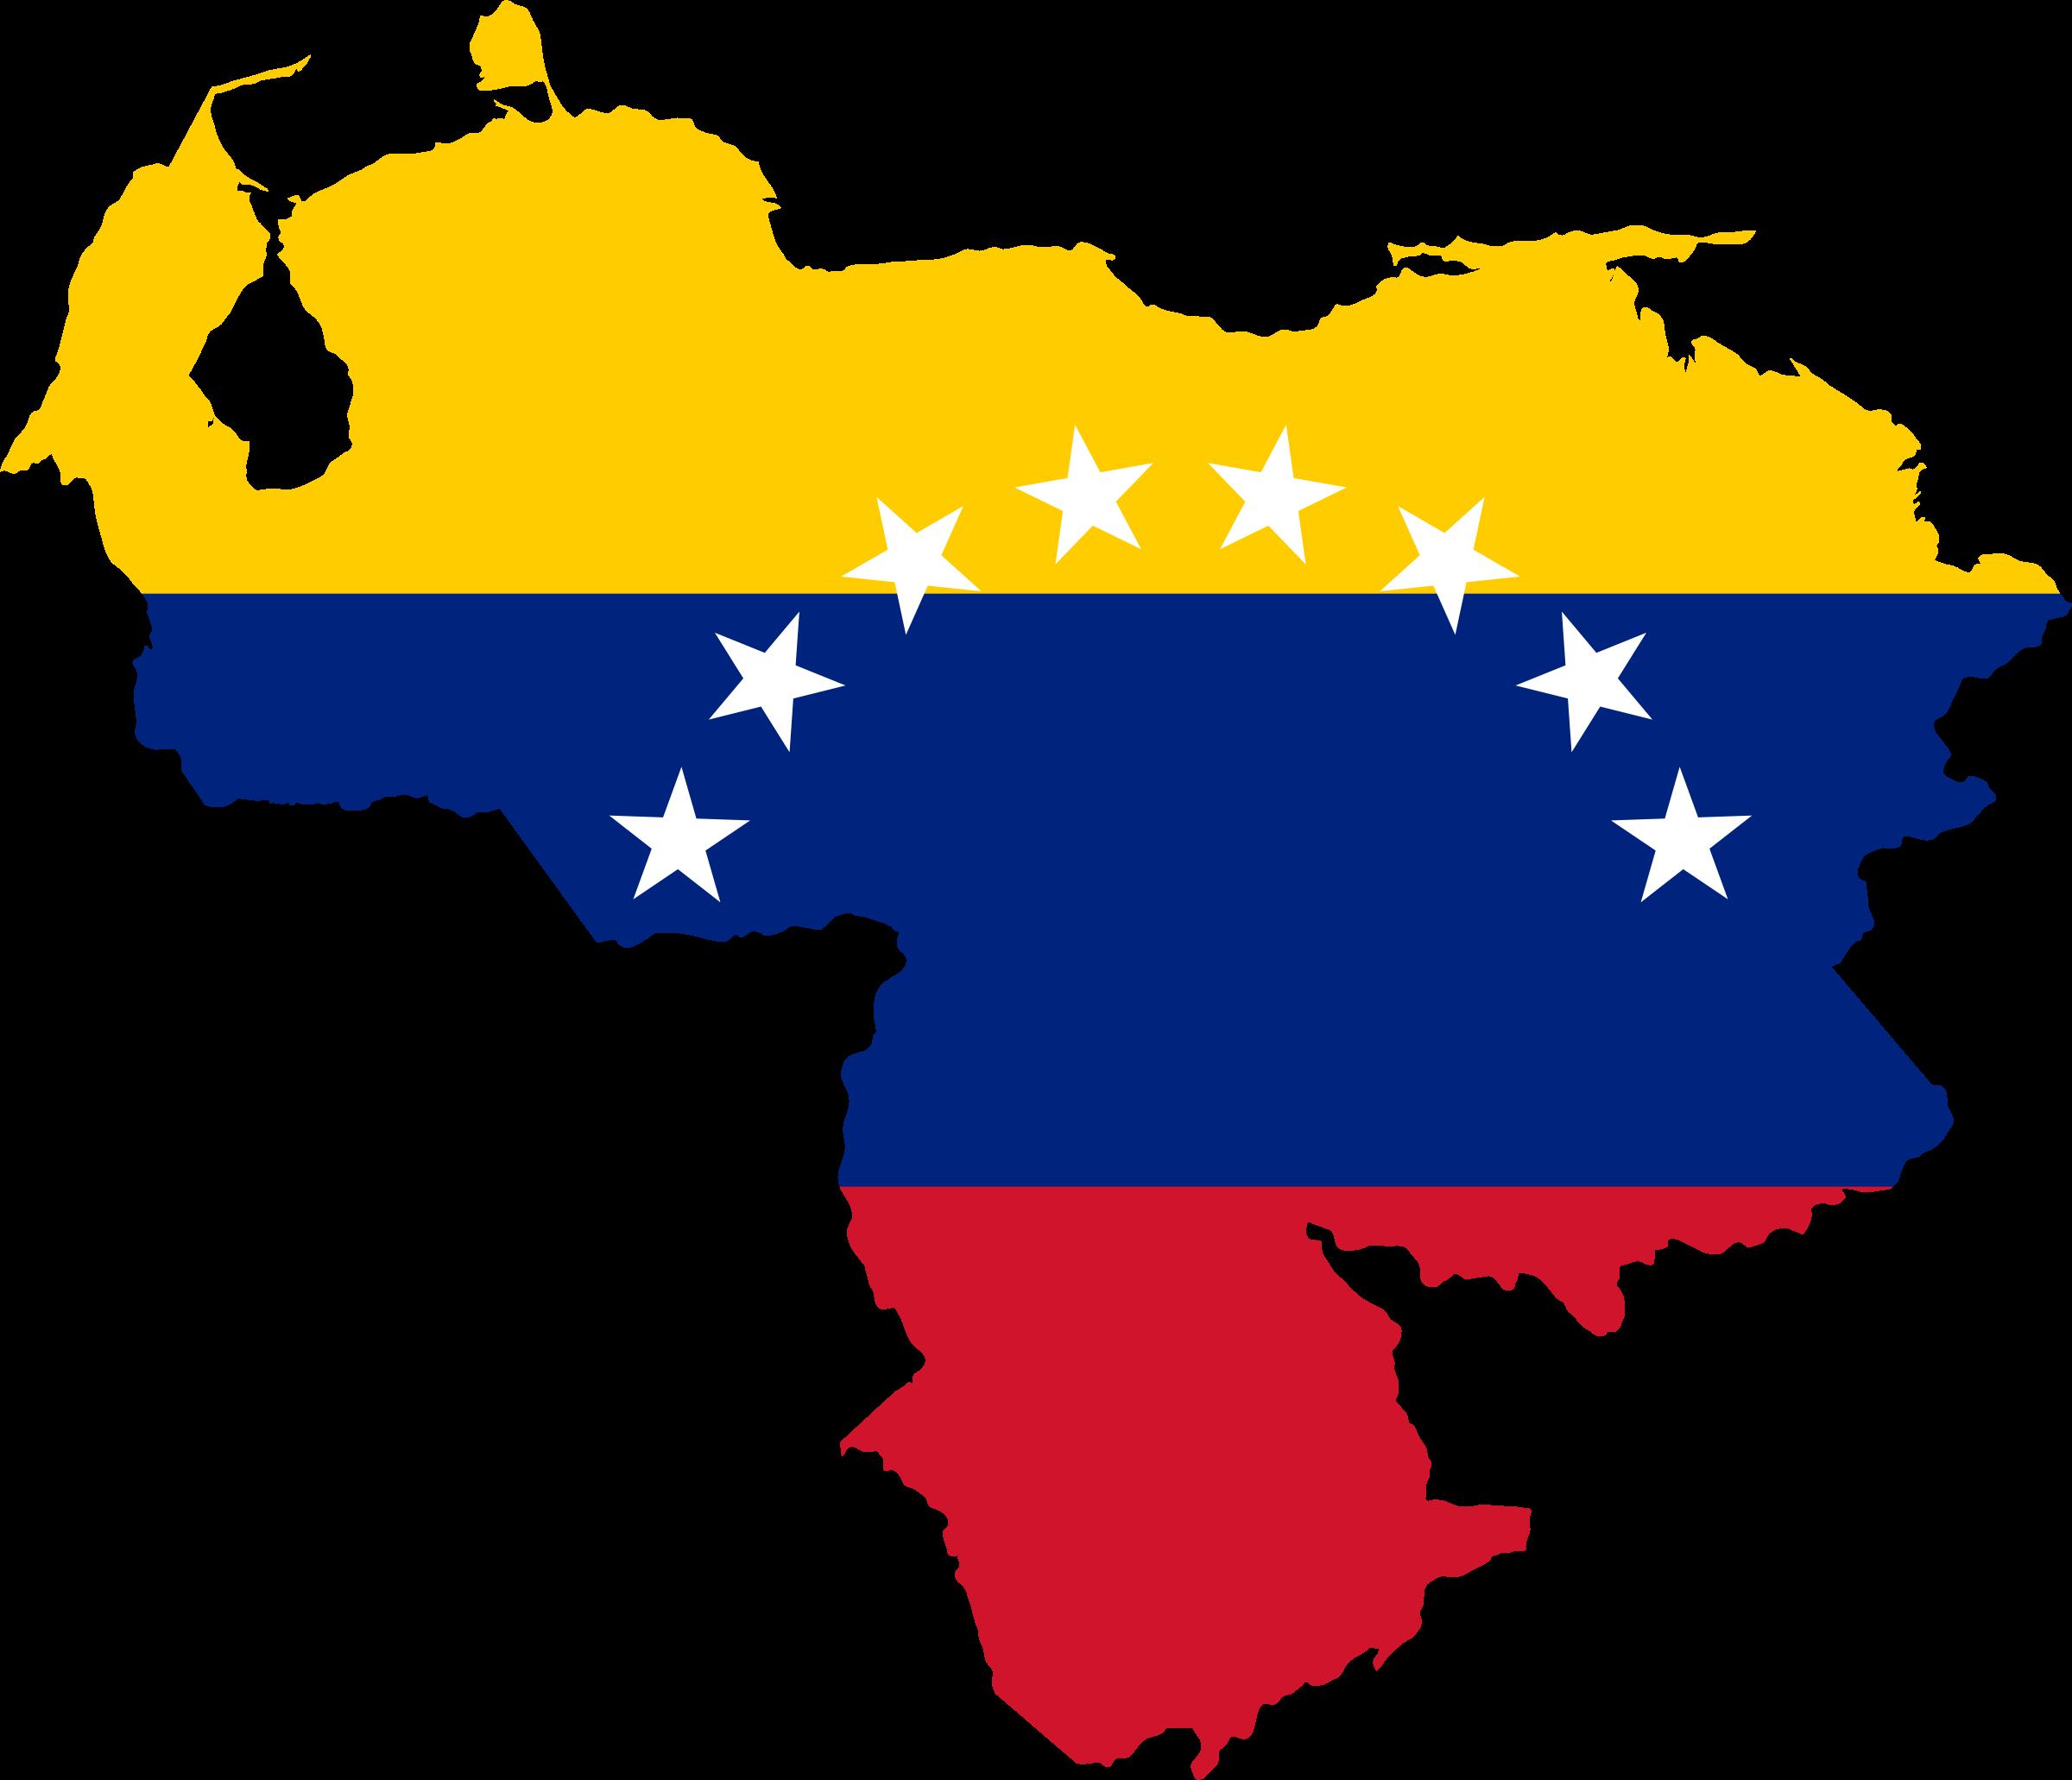 Clipart - Venezuela Flag Map